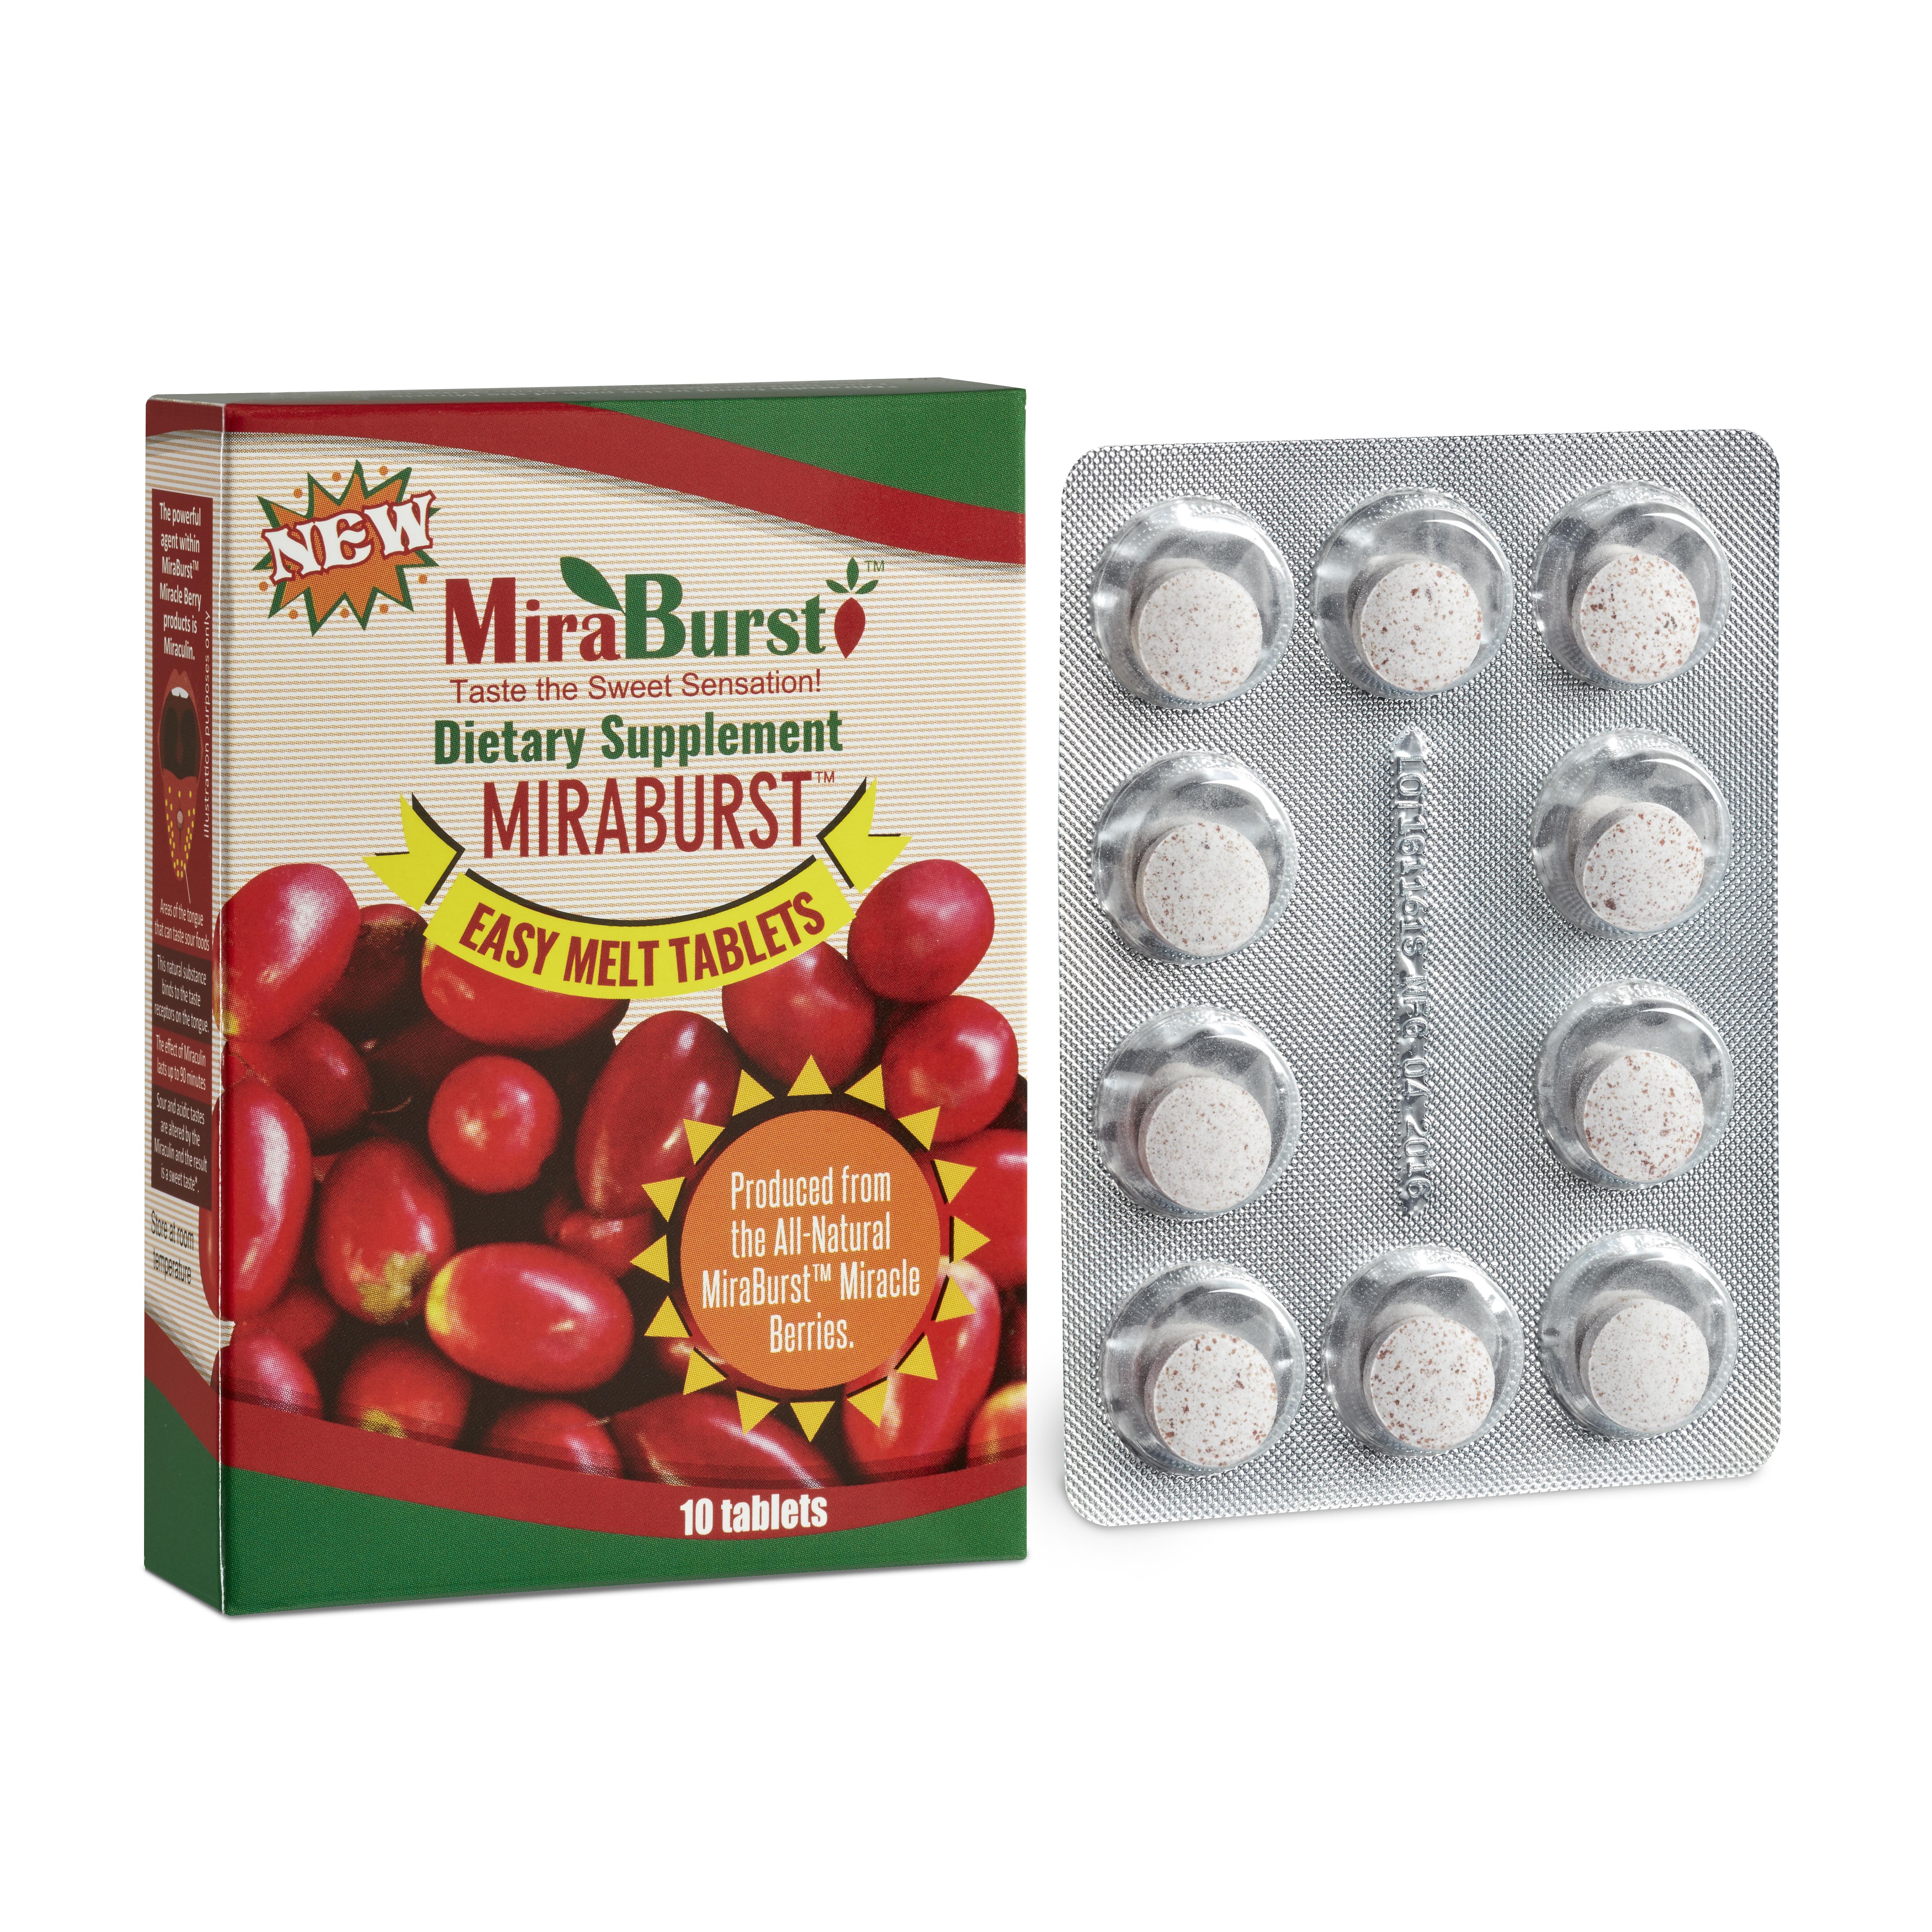 miraburst-product-box-and-blister-pack.jpg